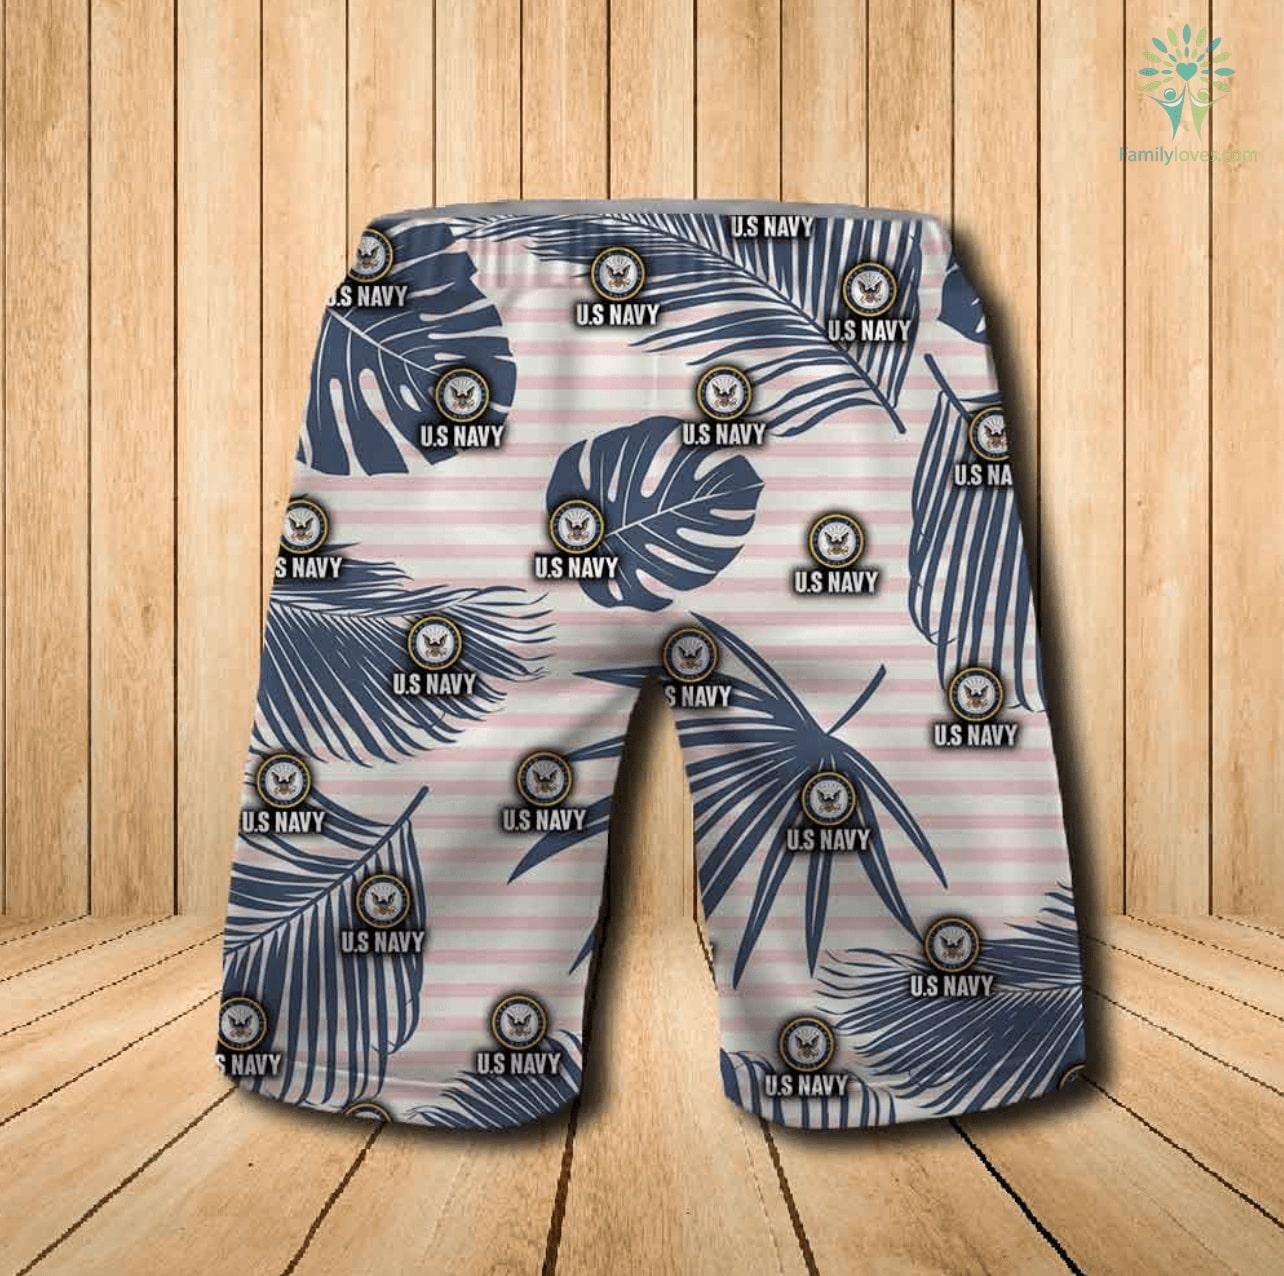 US navy all over printed hawaiian shorts